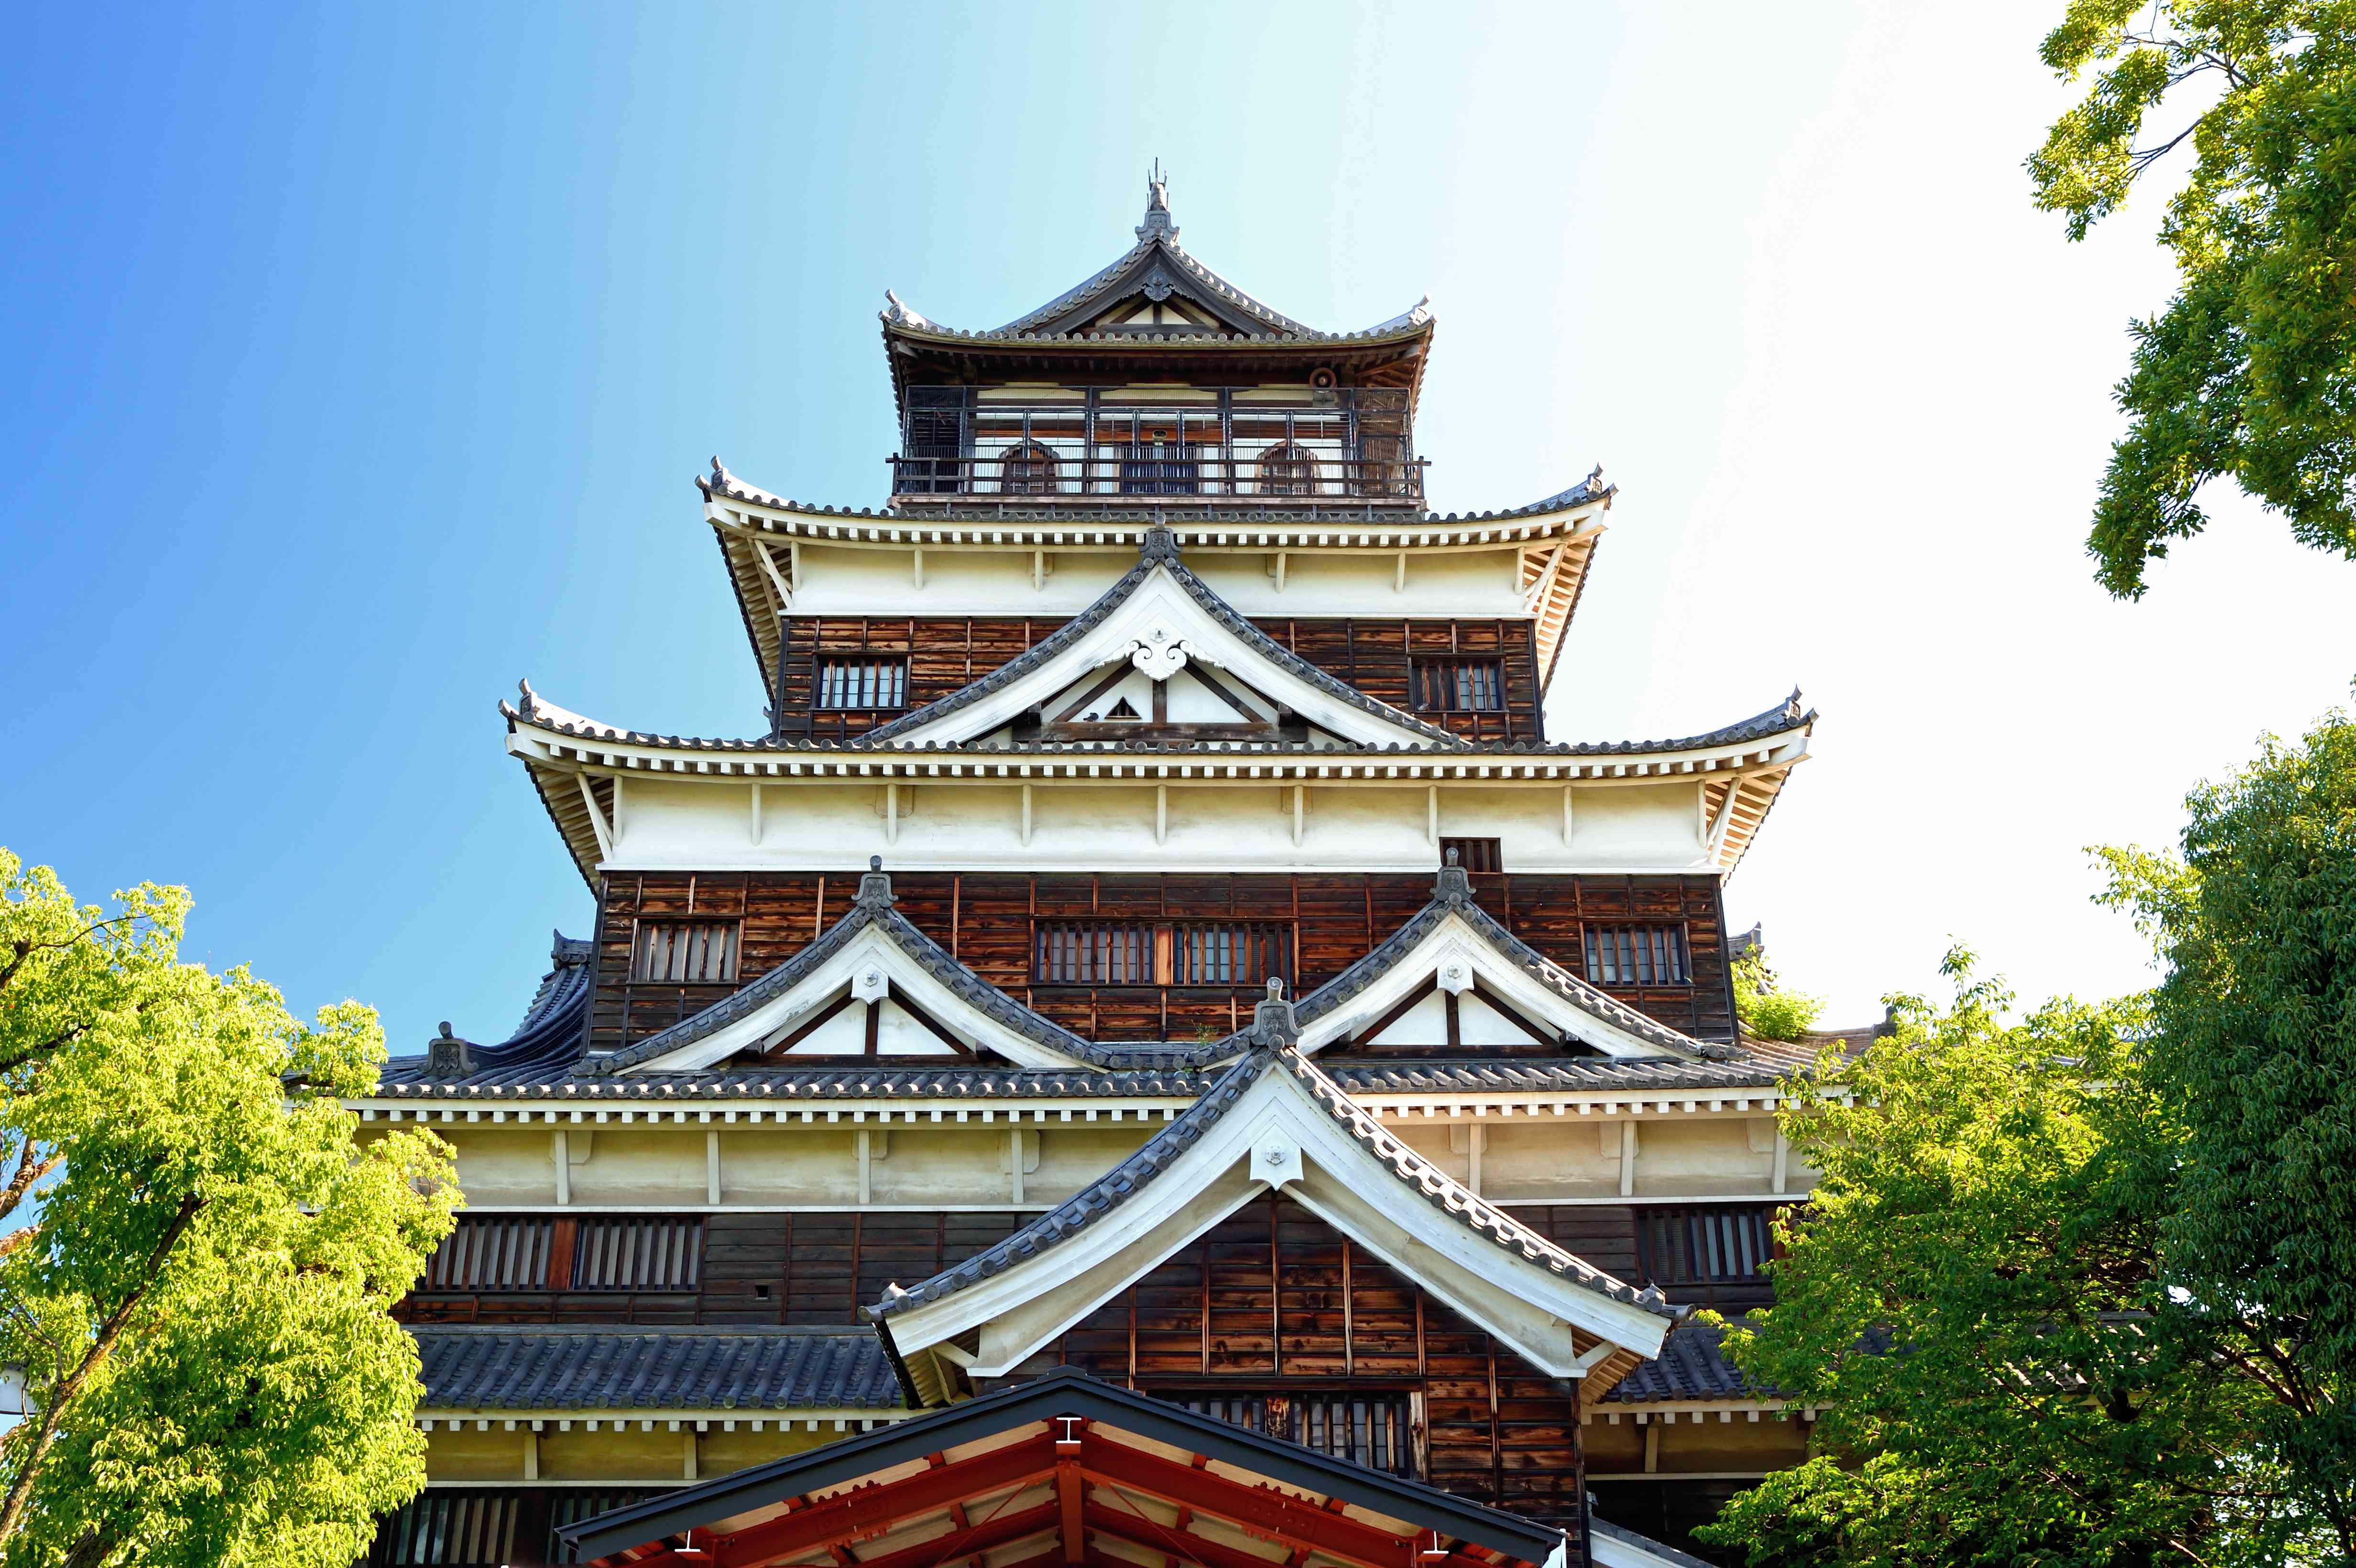 Hiroshima castle tower in Japan